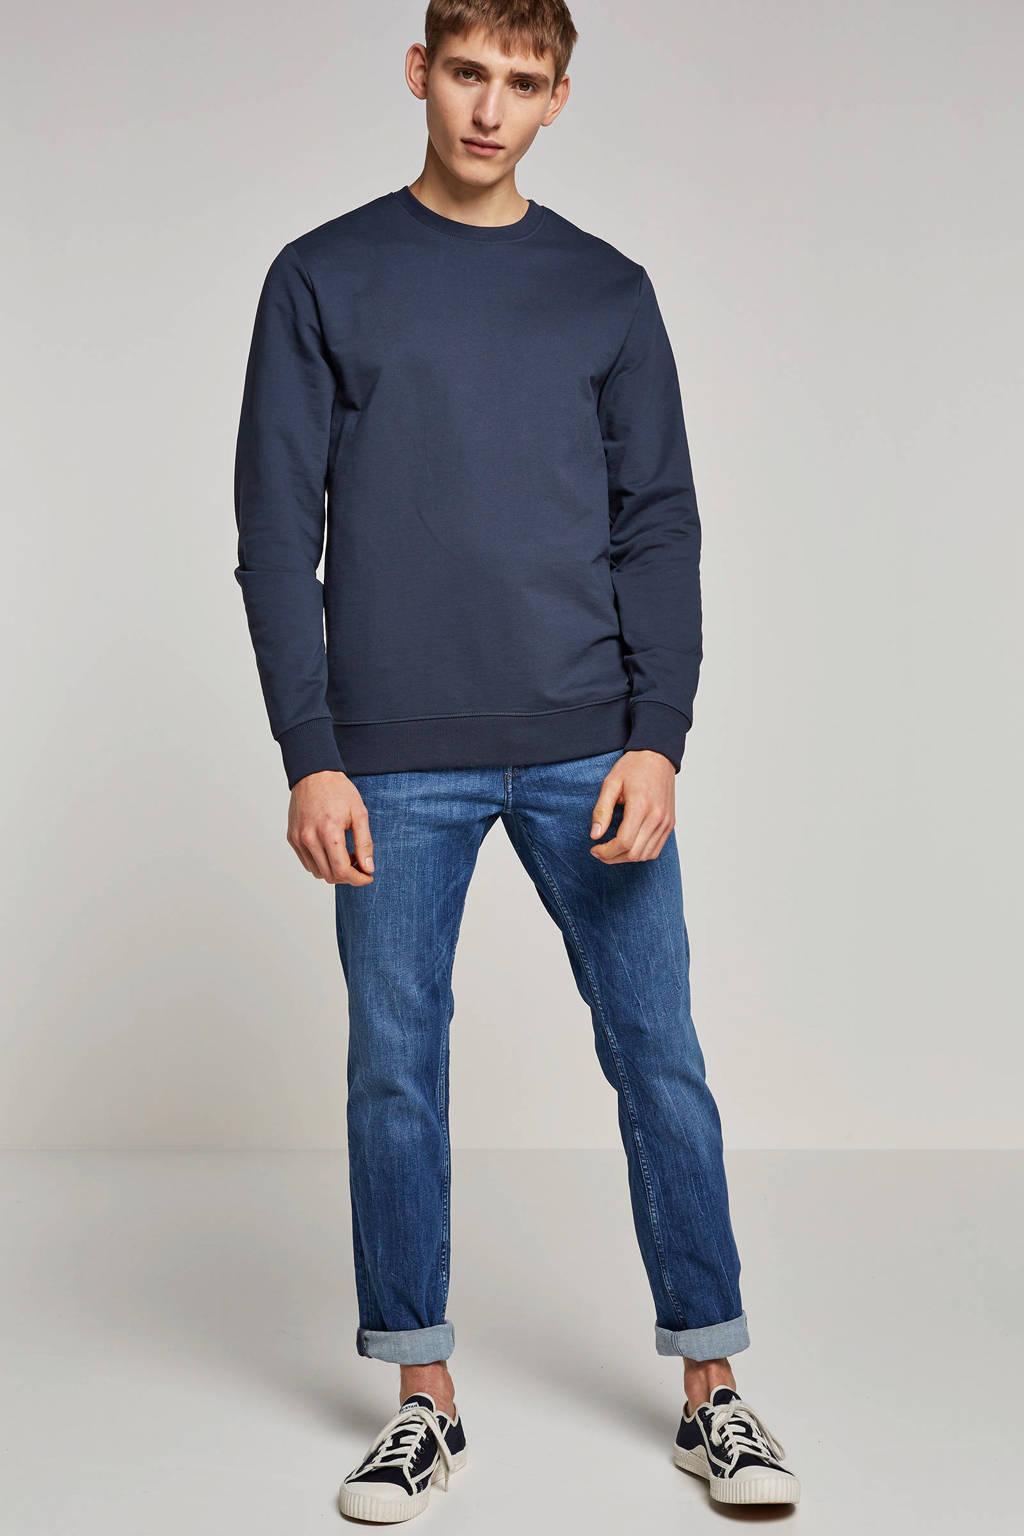 Pepe Jeans regular fit jeans Spike, Dark denim